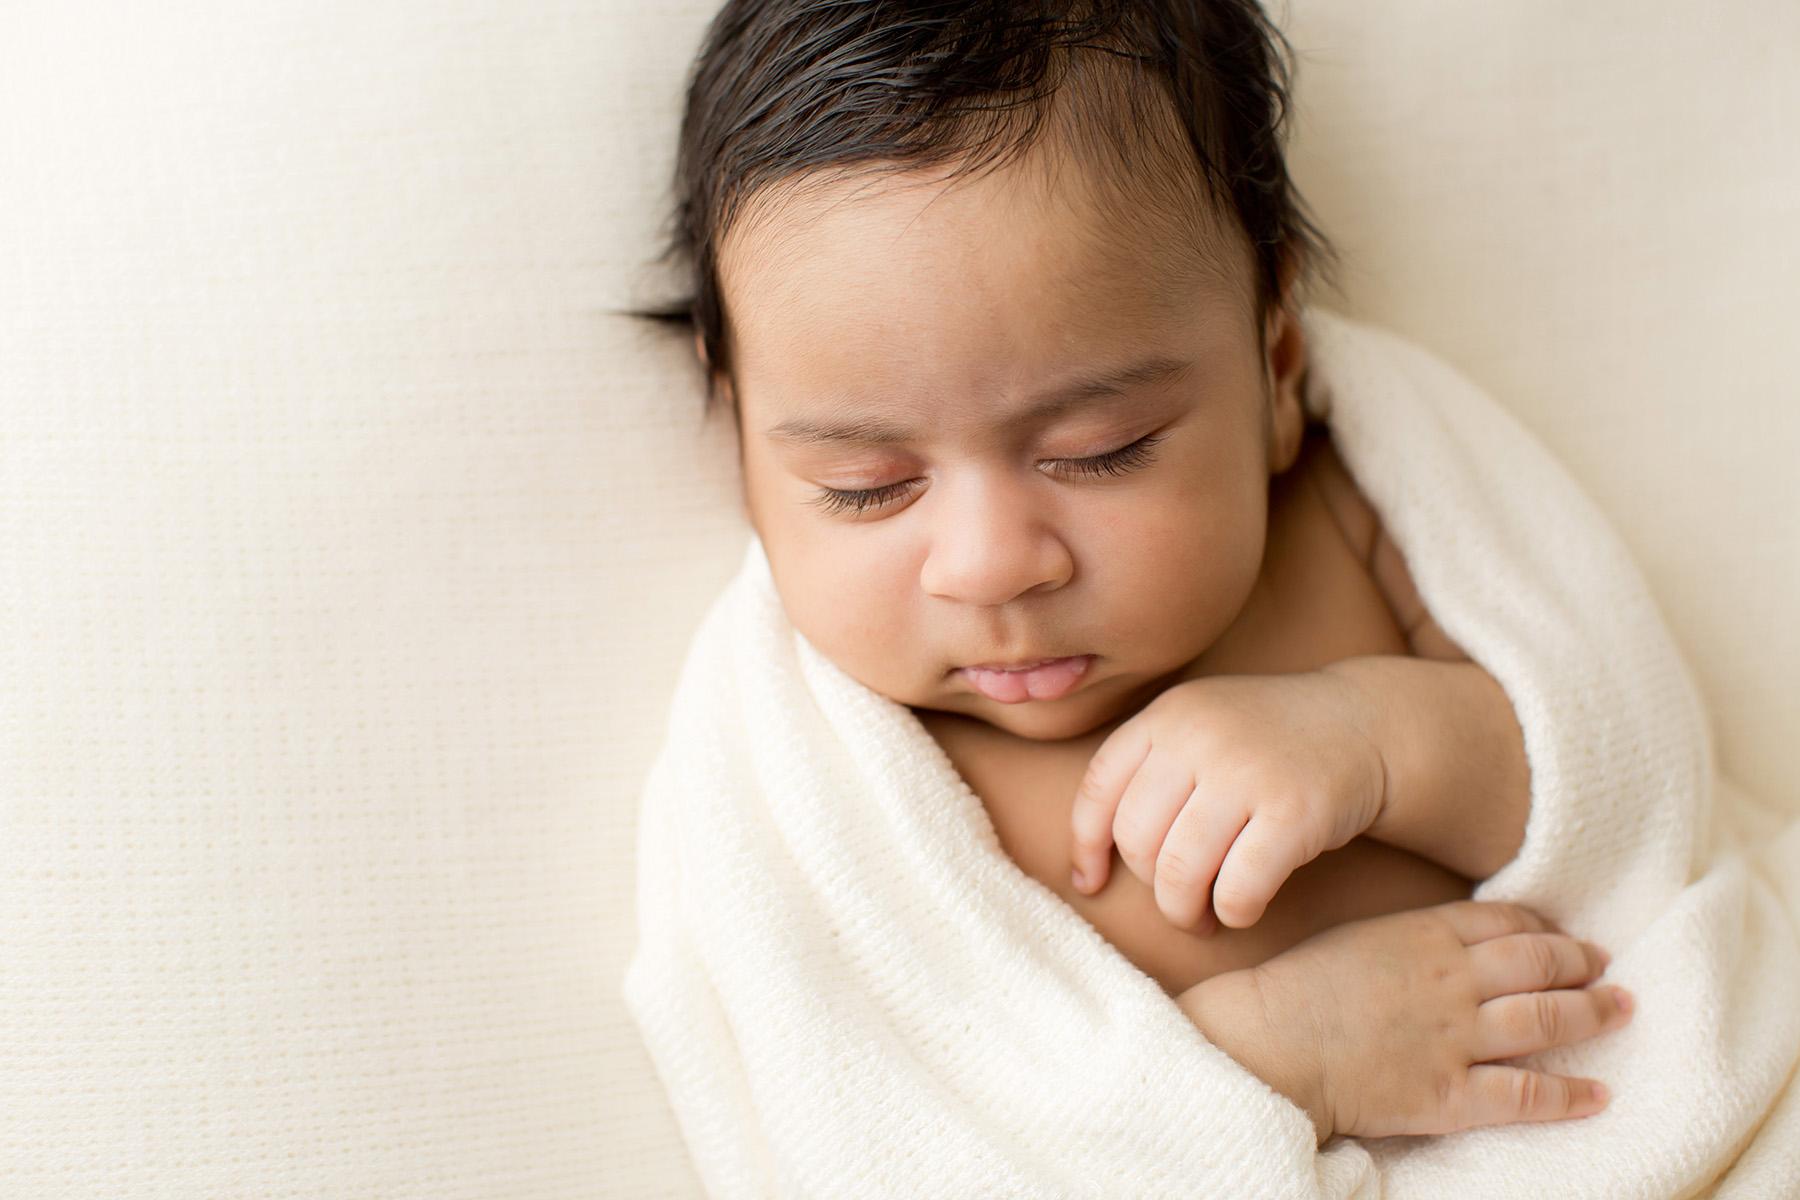 Newborn Family Maternity Photographer in Louisville KY | Julie Brock Photography | Lexington KY Newborn Photographer | natural baby photos | Louisville Photographer.jpg